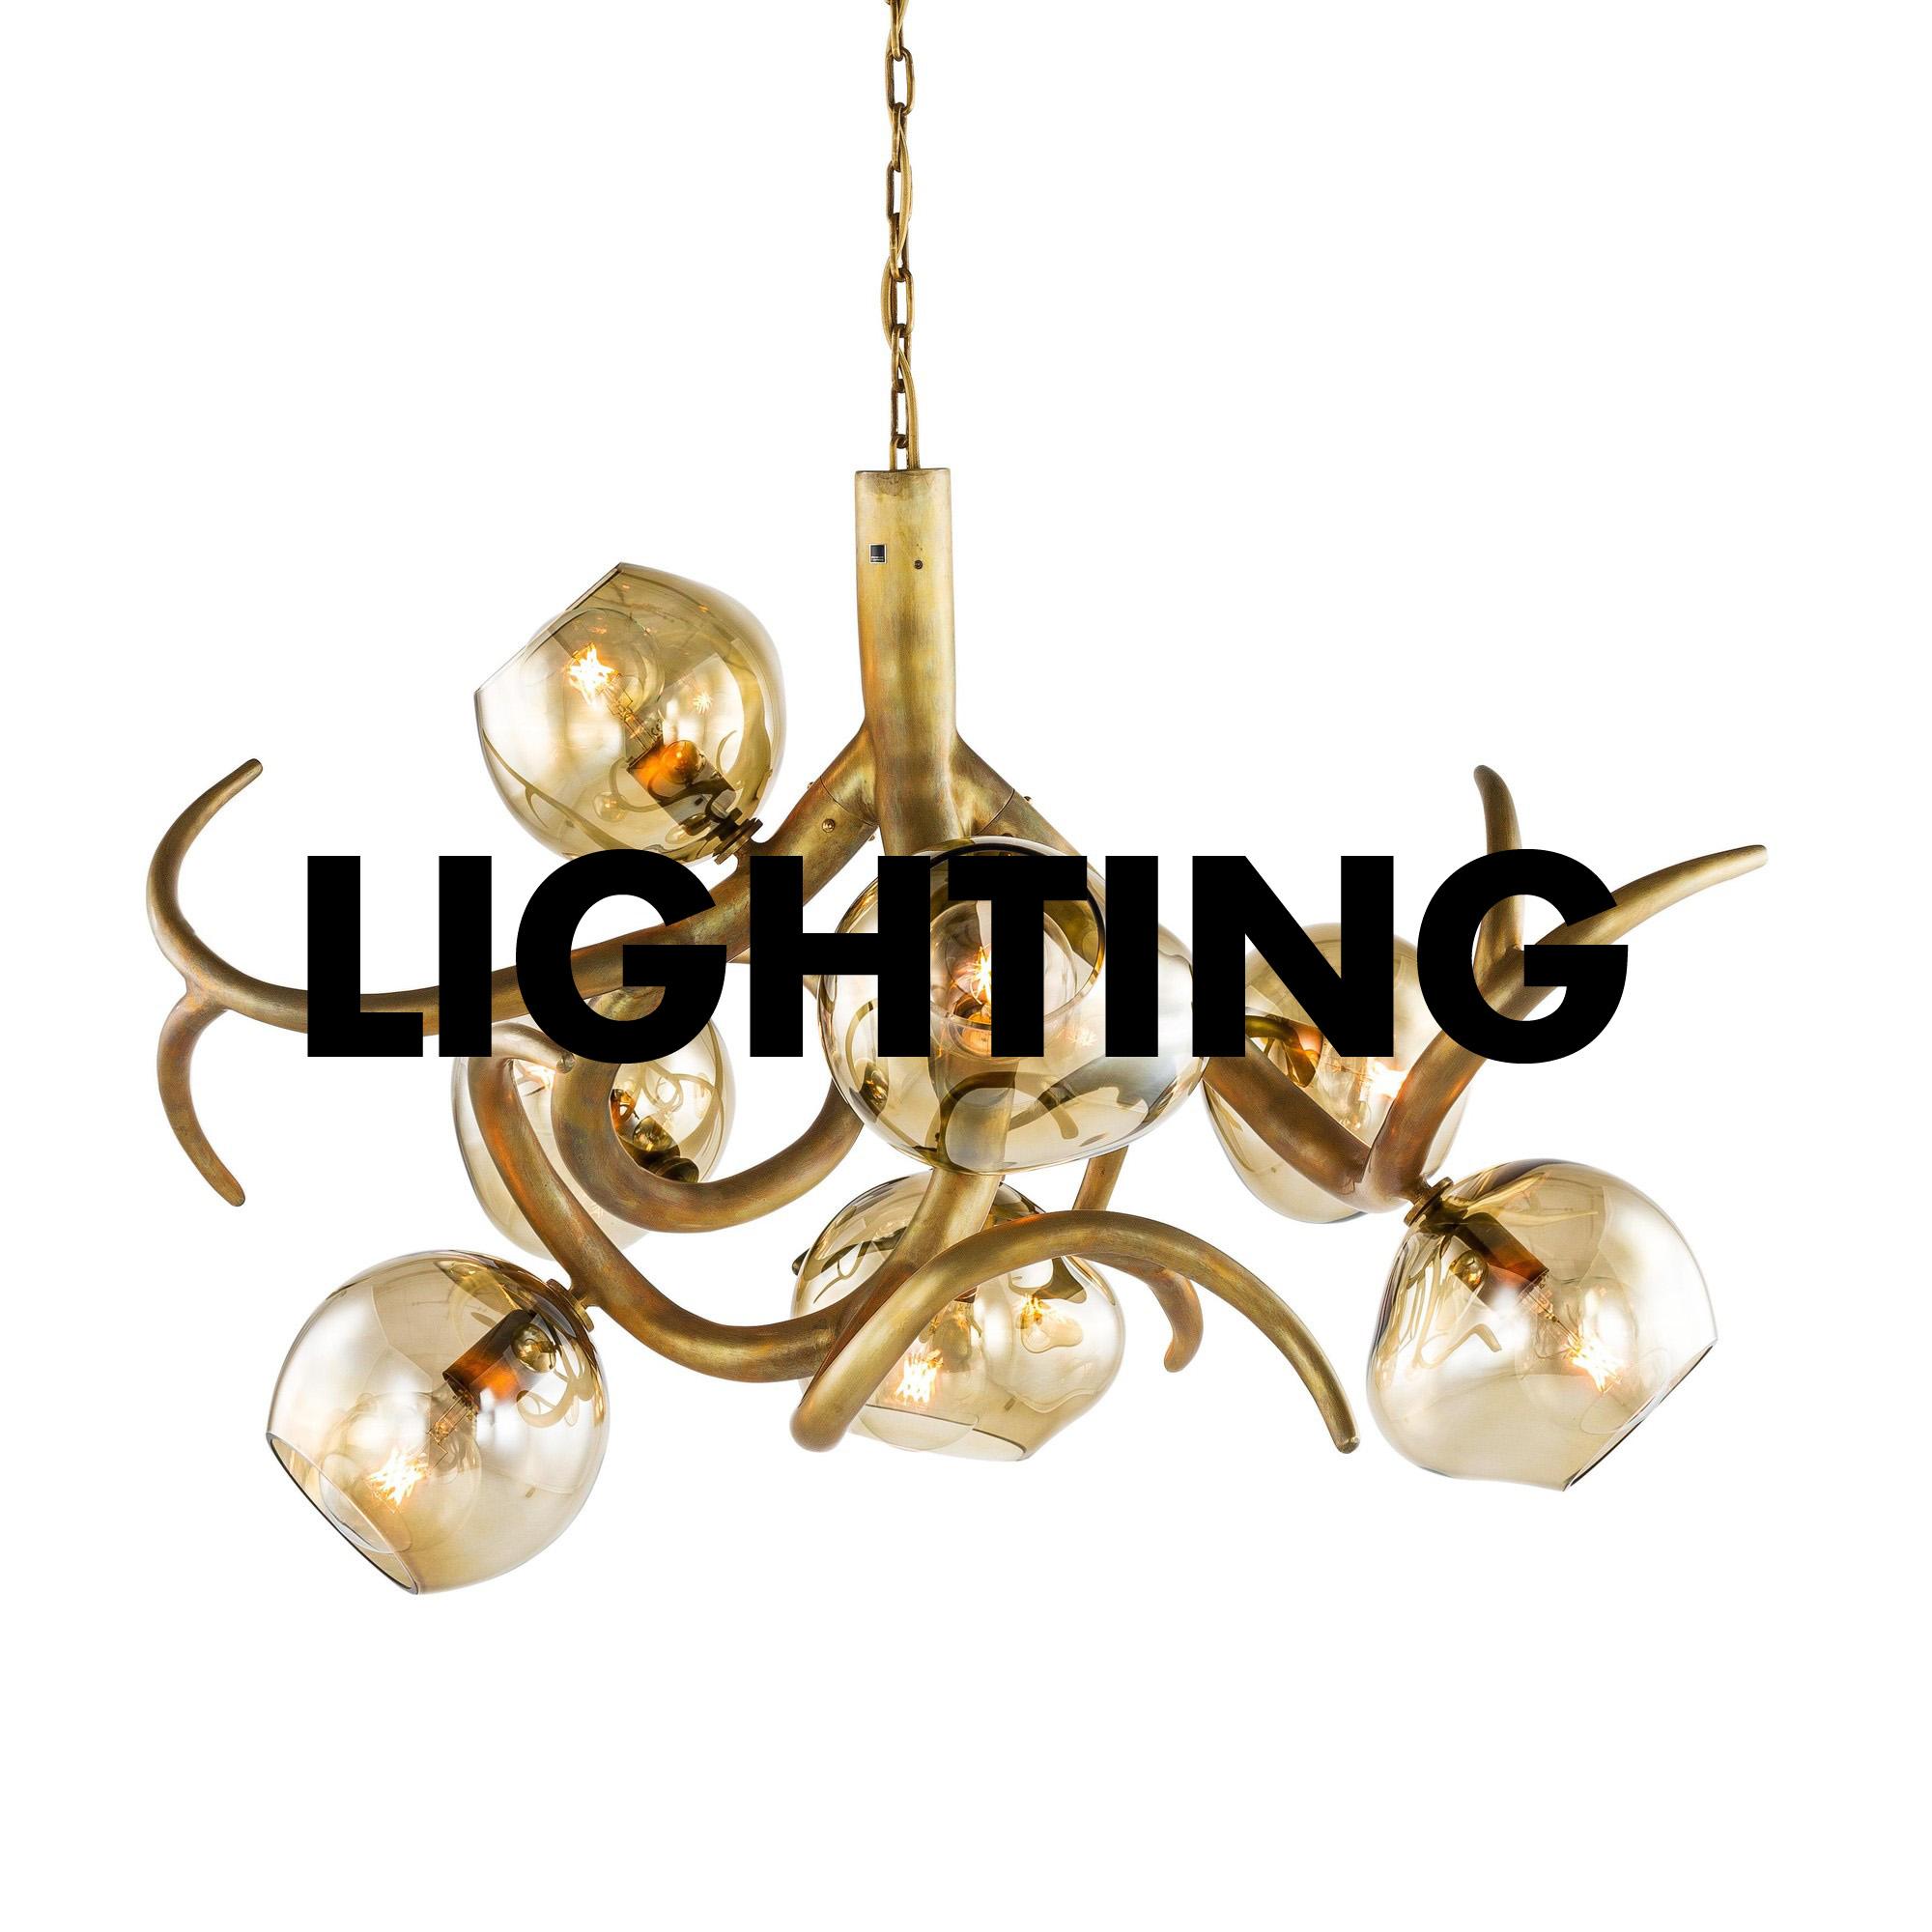 MKM-LIGHTING.jpg